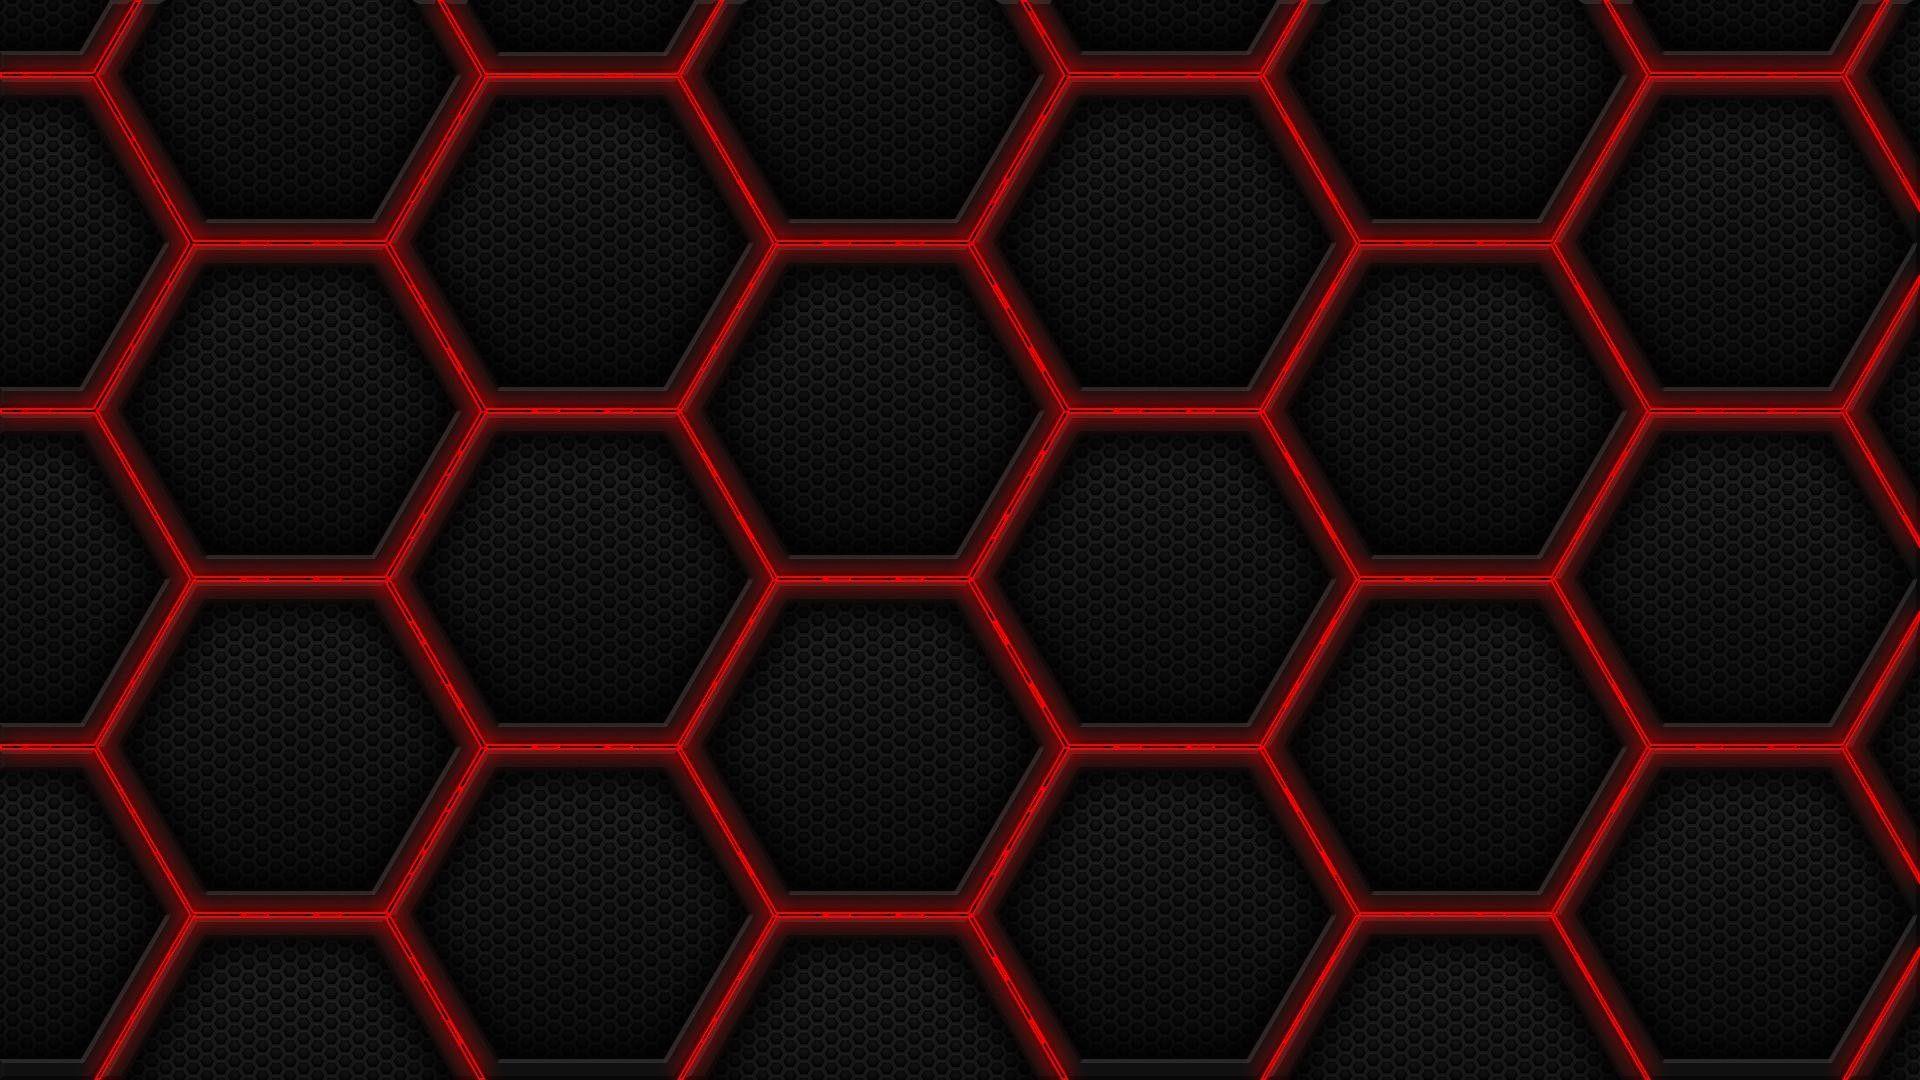 General 1920x1080 Abstract Hexagon Textured Hexagon Wallpaper Hexagon Phone Background Patterns